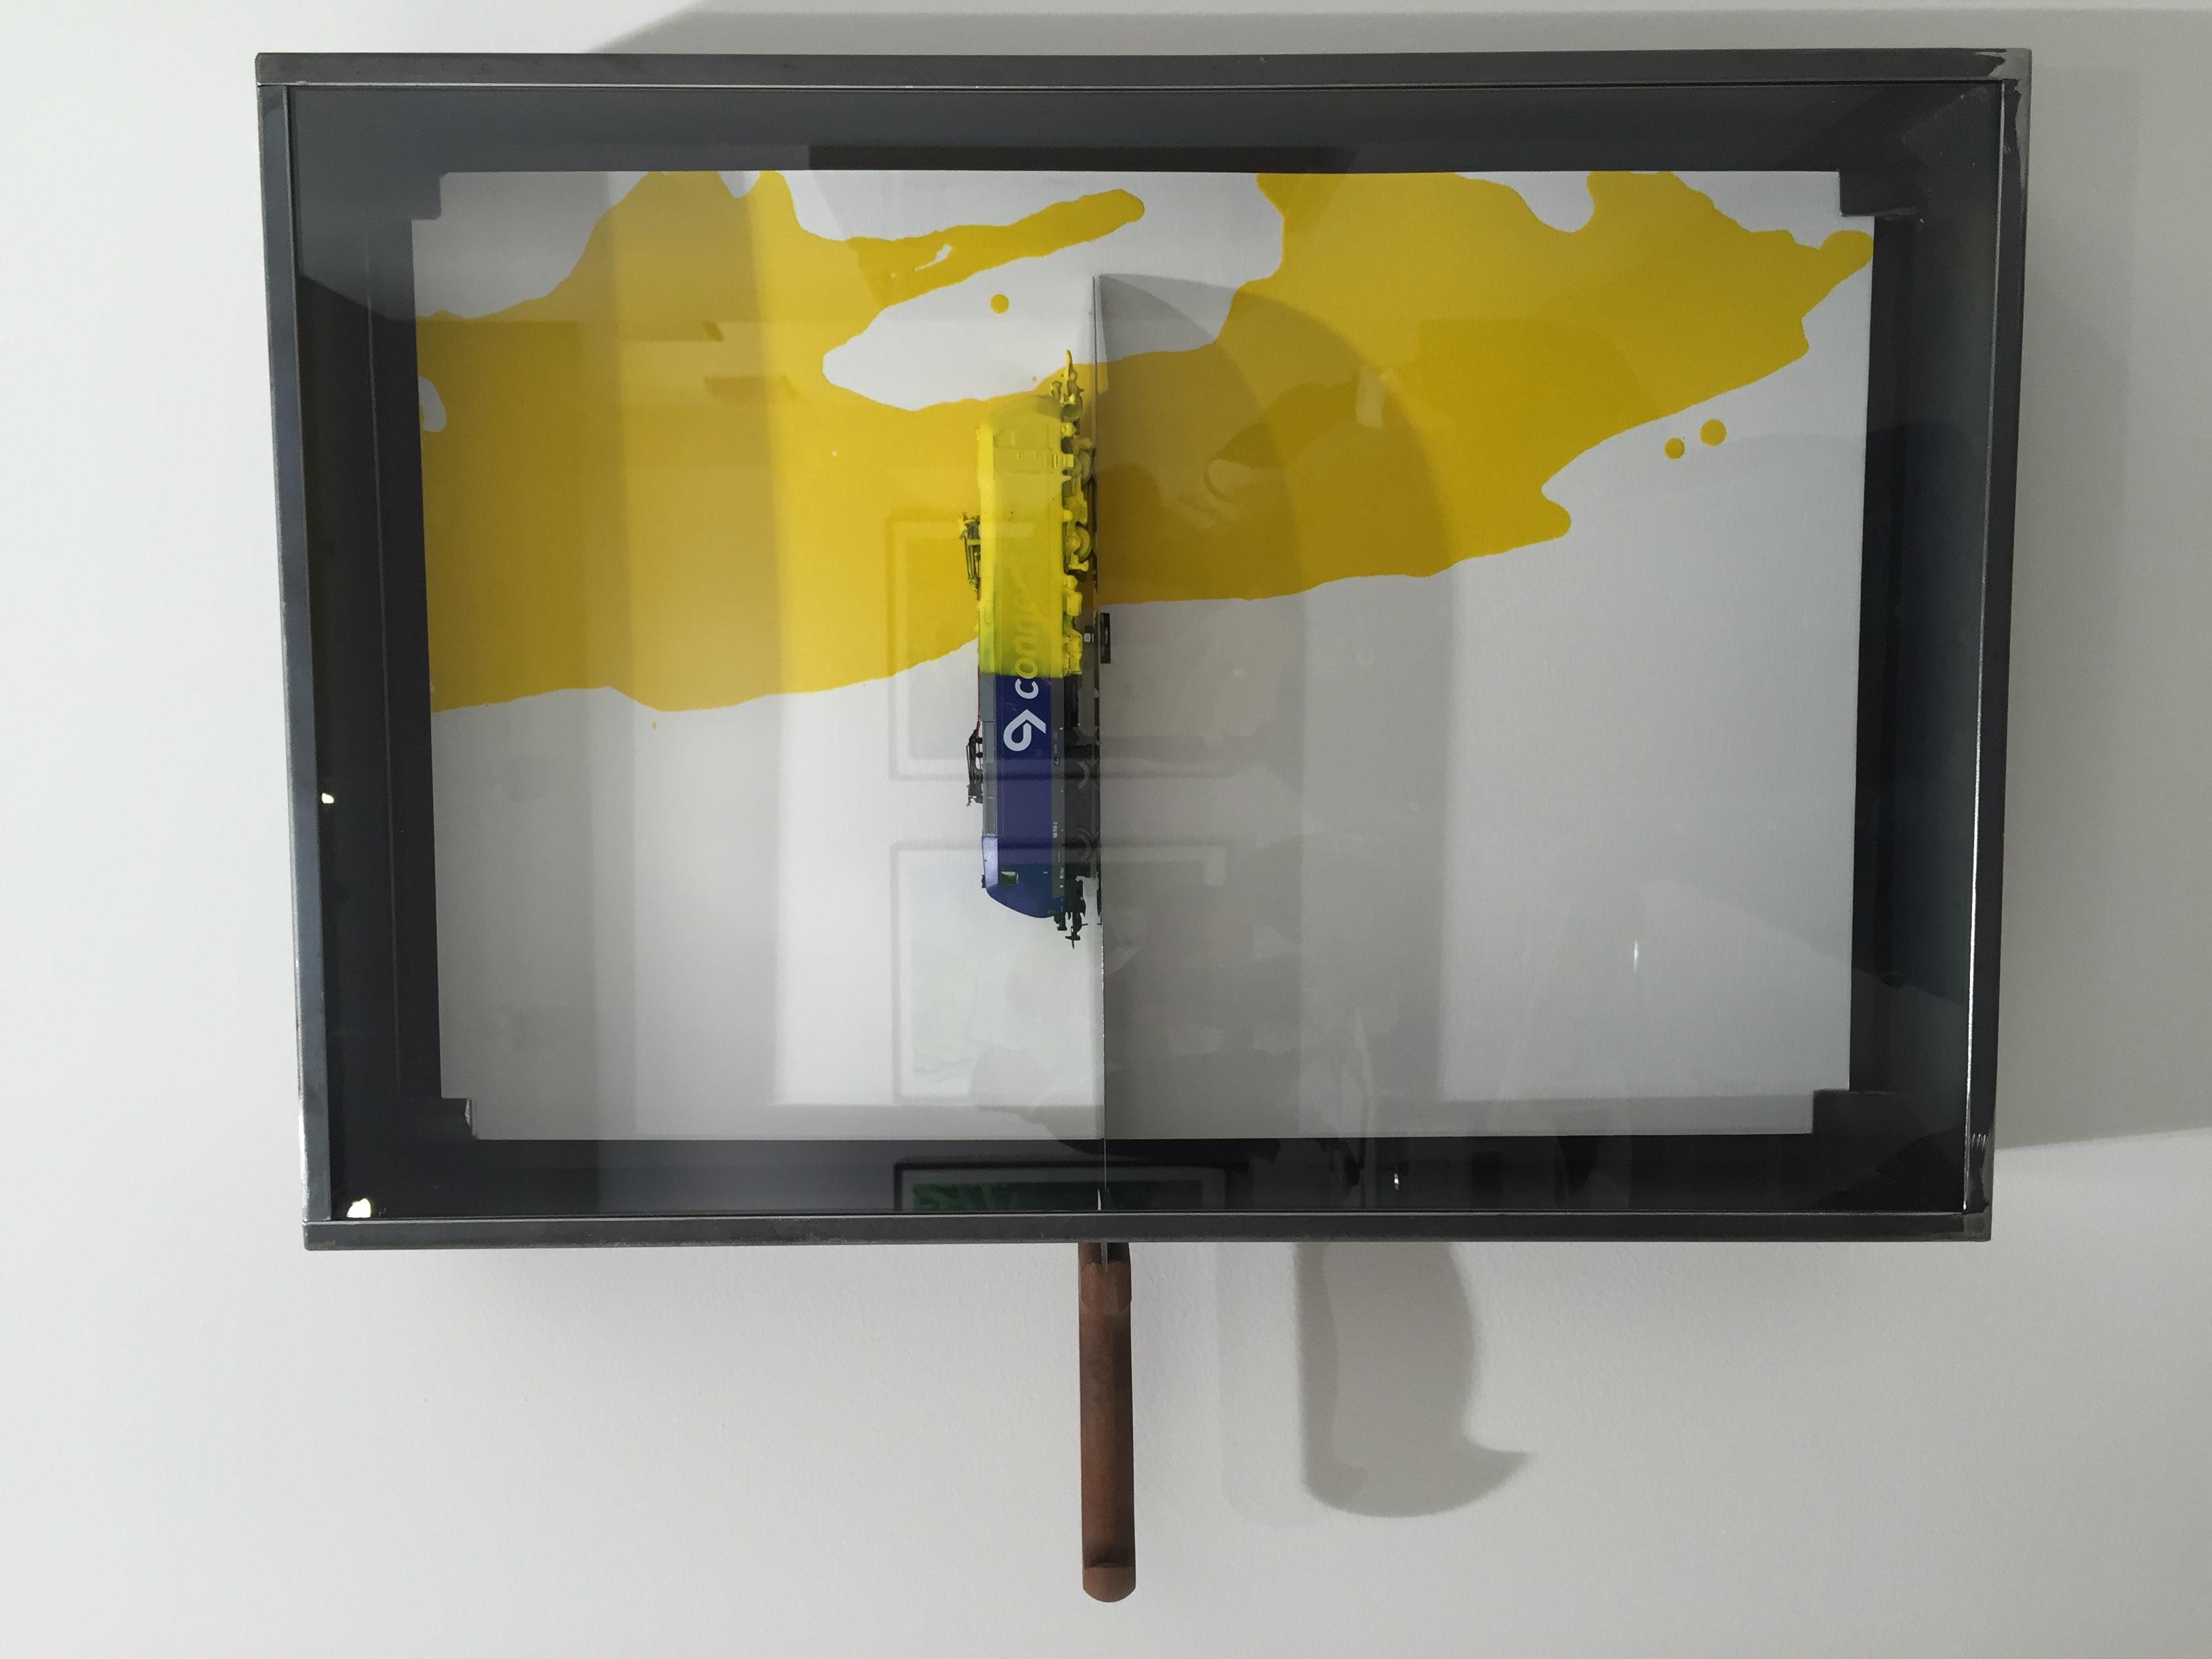 Jannis Kounellis | Untitled, 2005